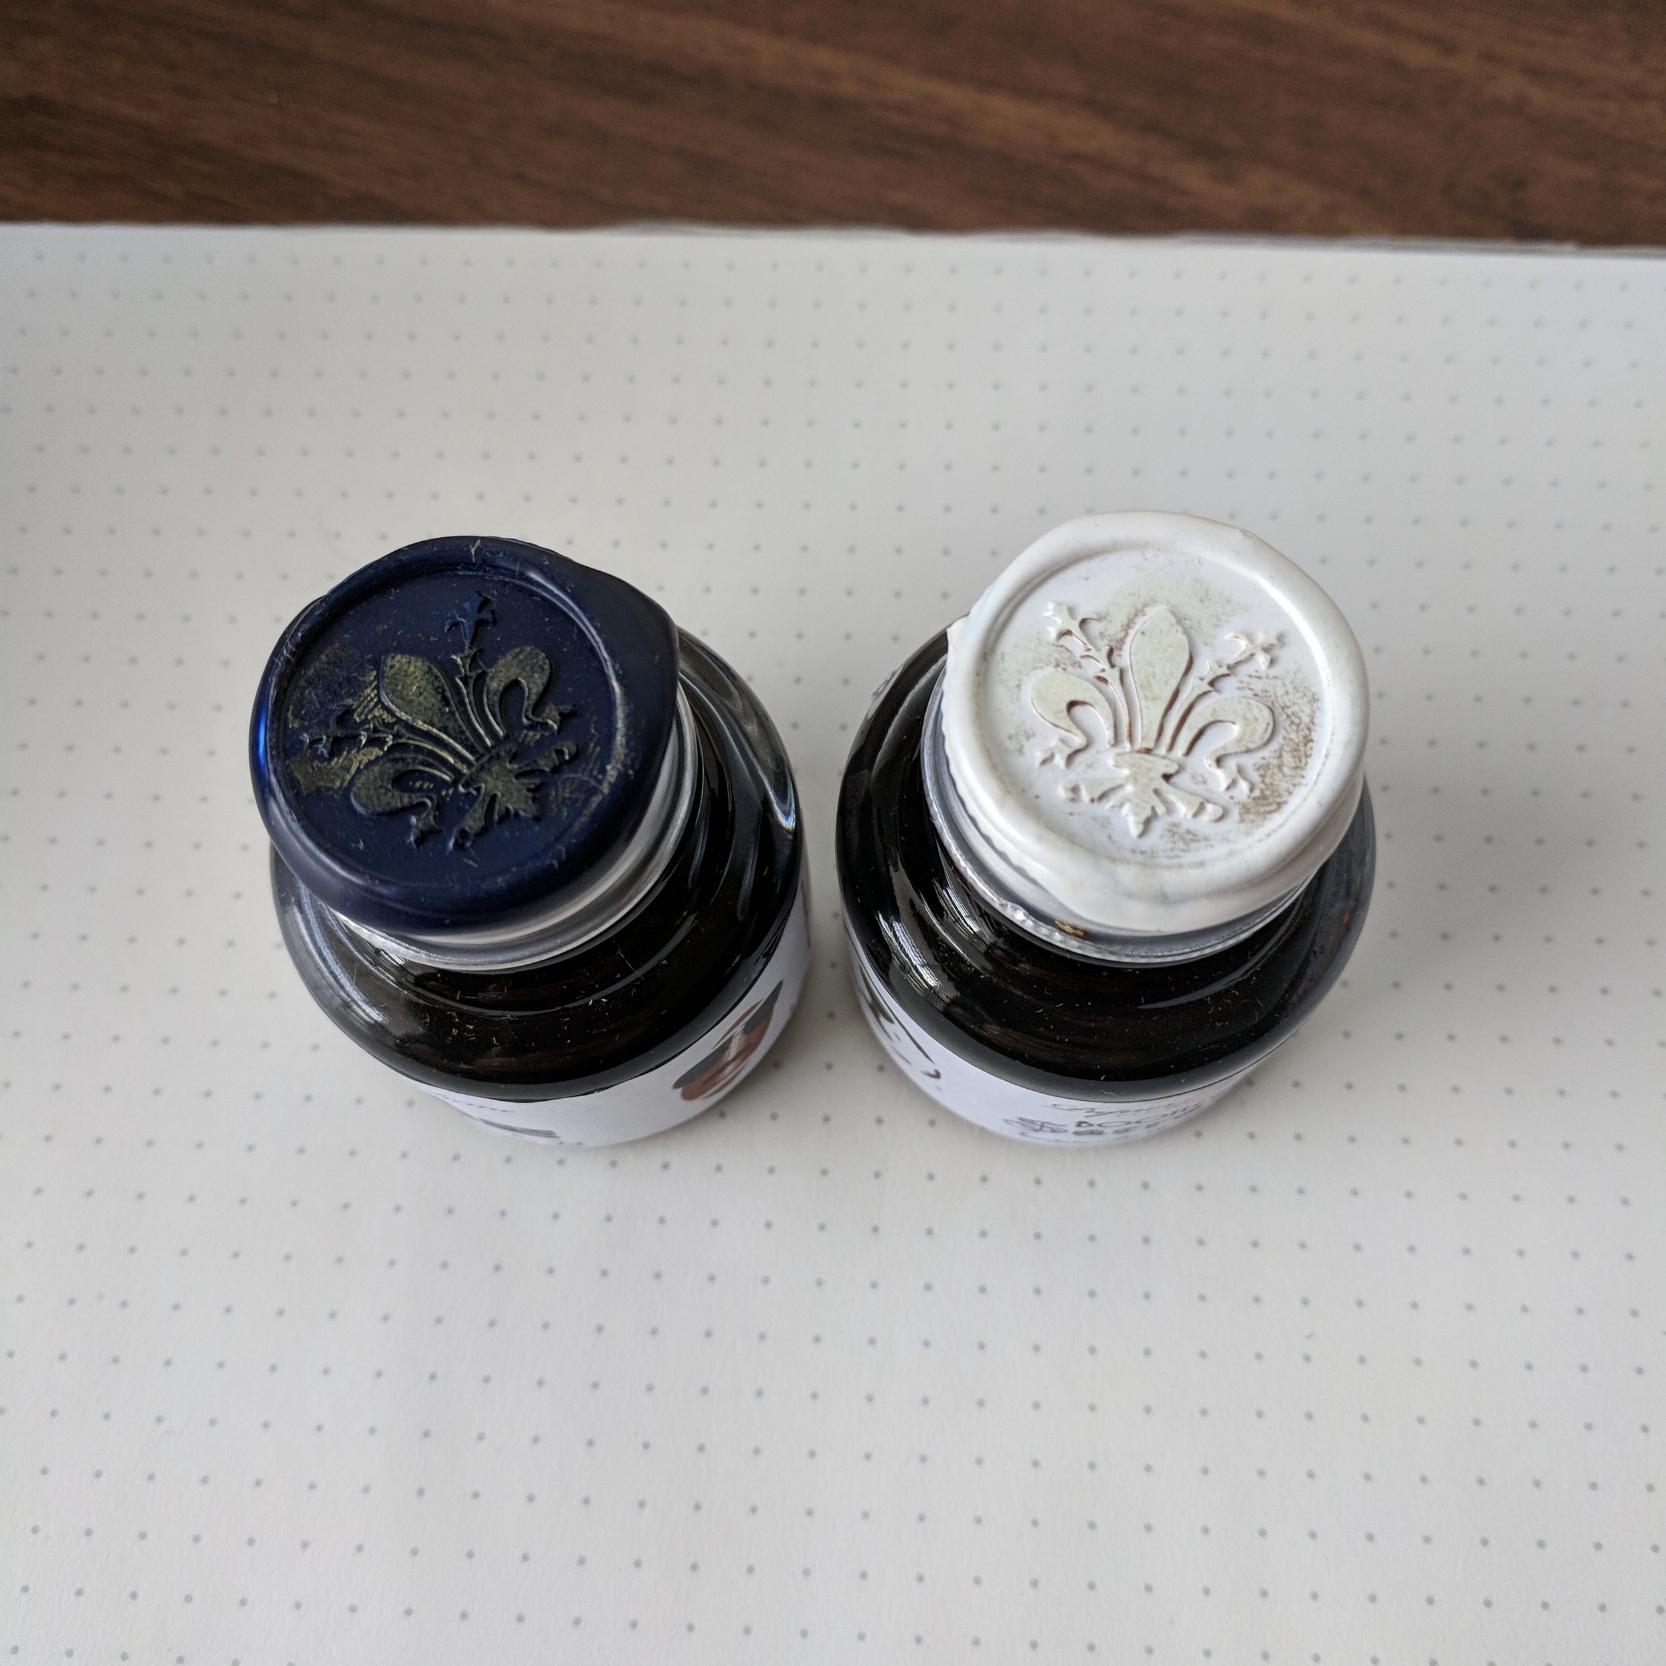 Papier-Plume-Chicago-Inks-Wax